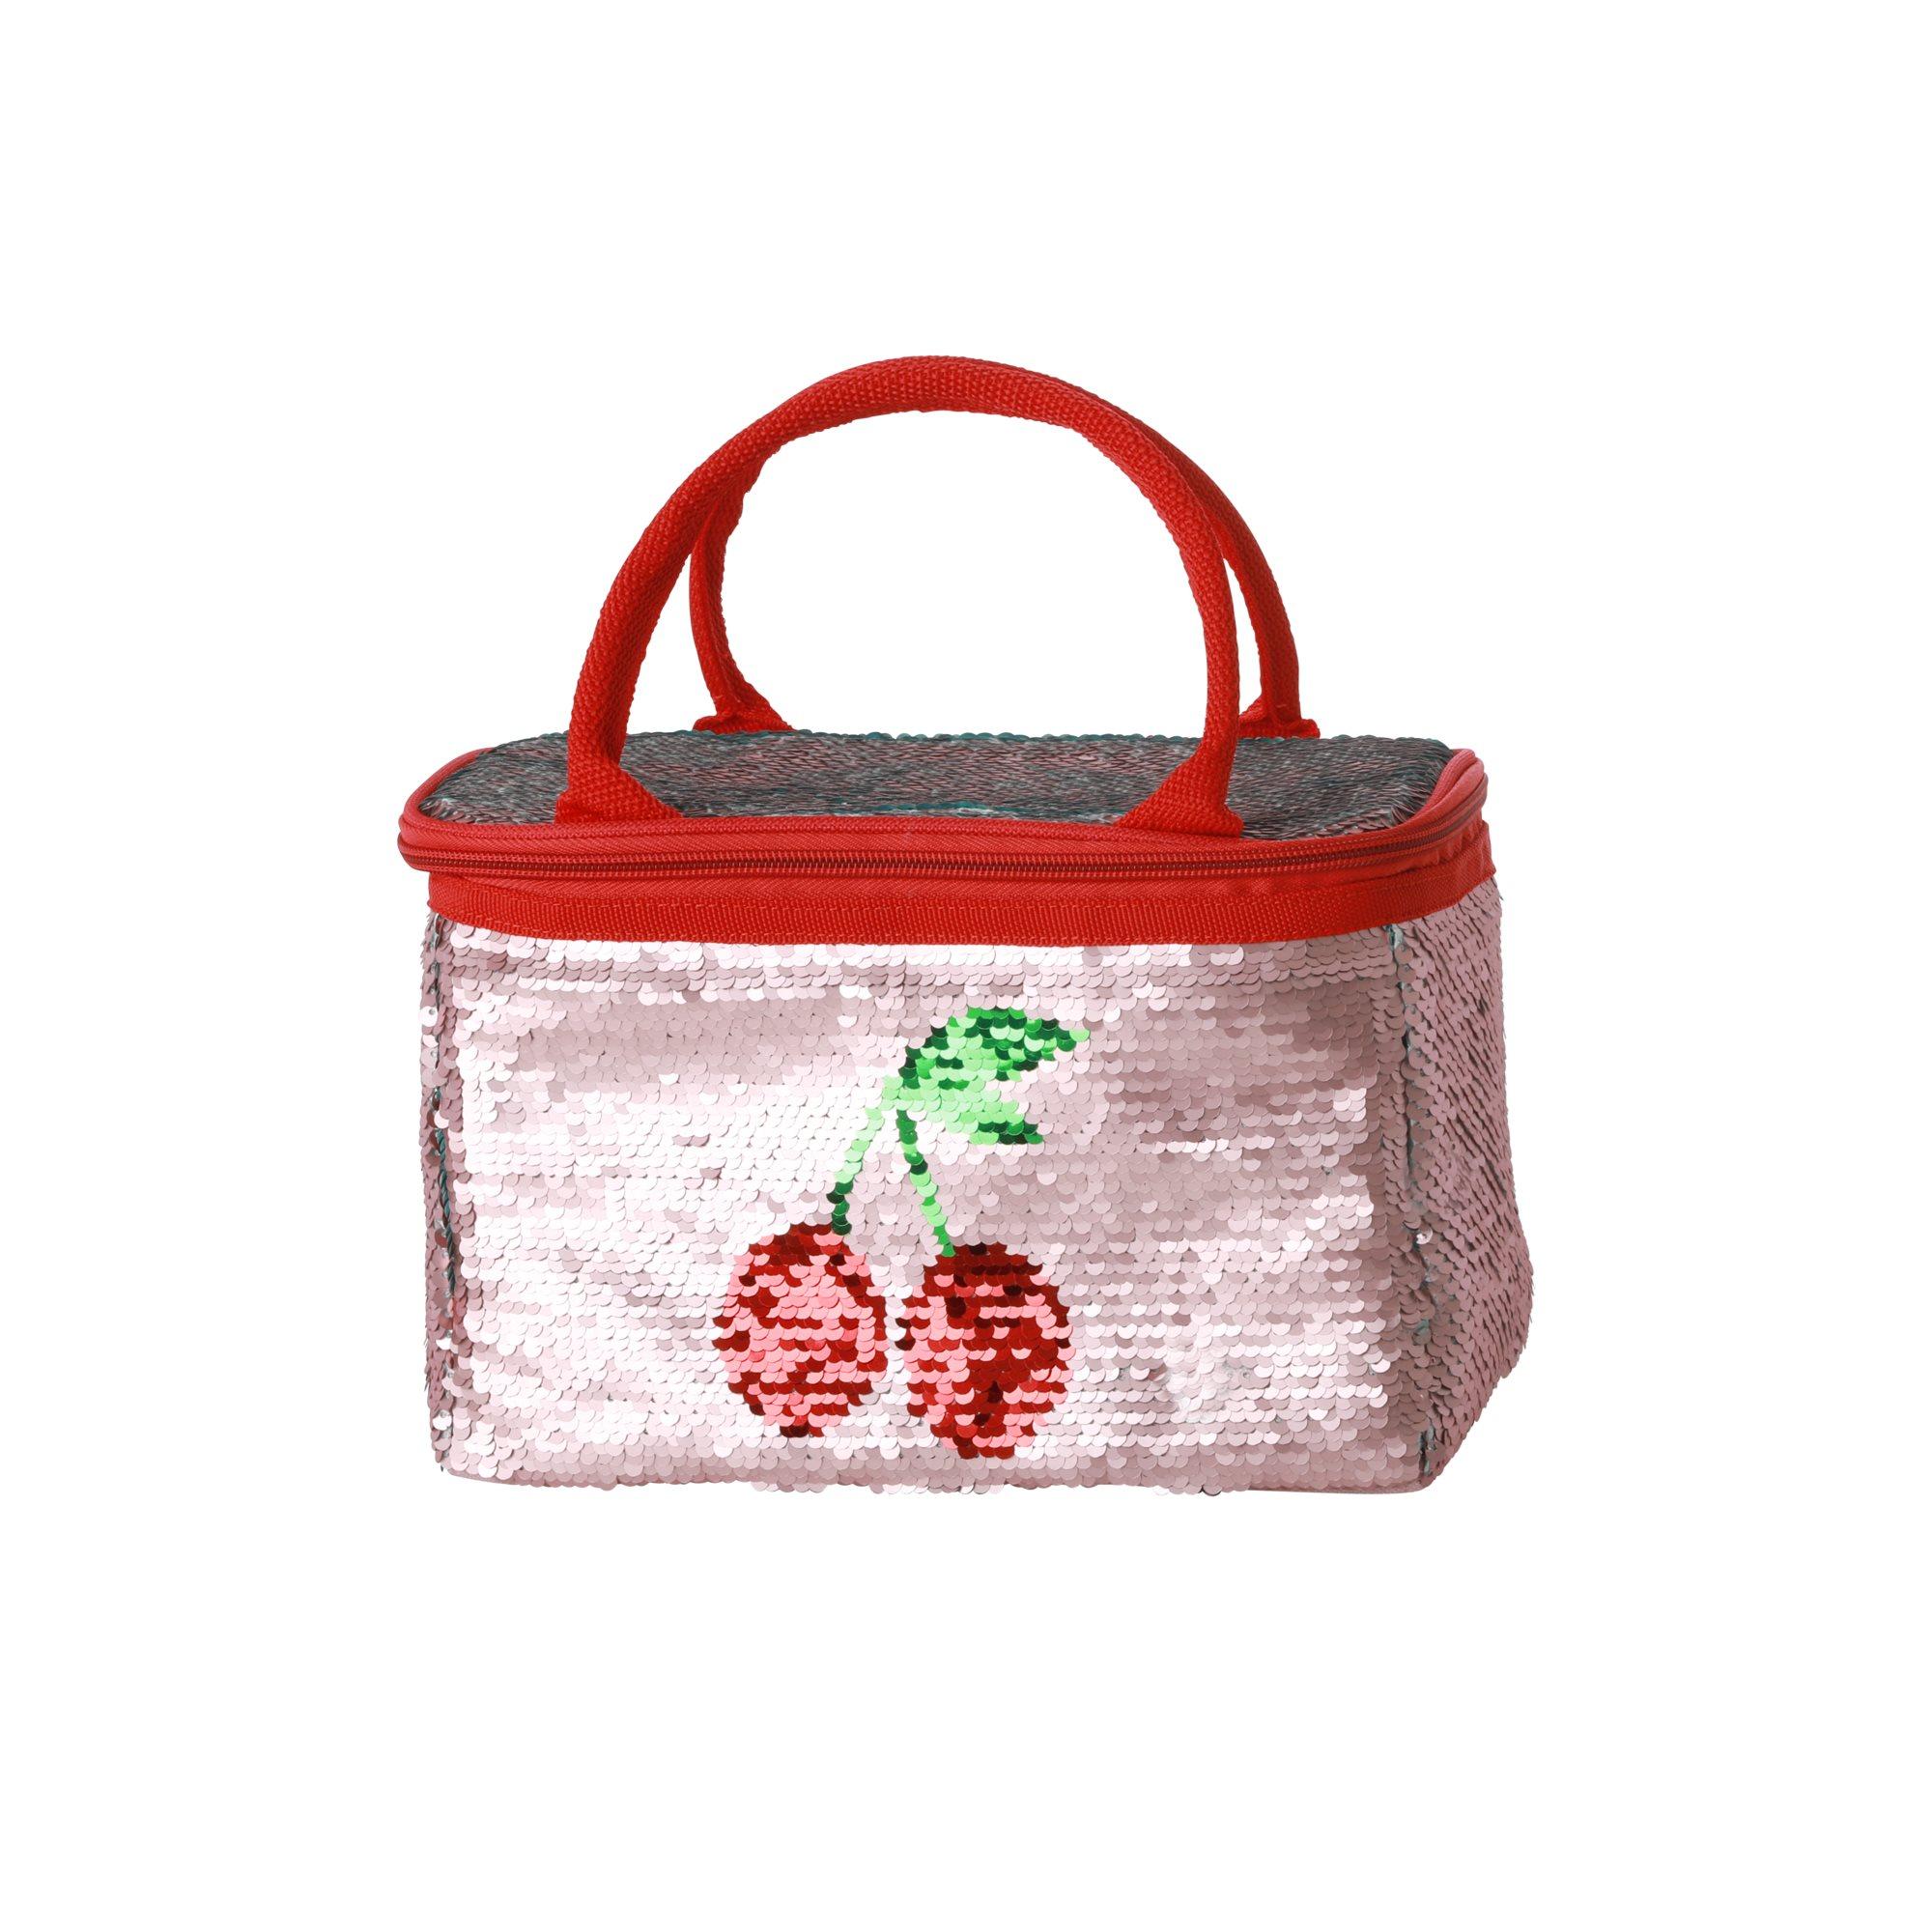 Rice - Sequin Cooler Bag 4 L w. Cherry